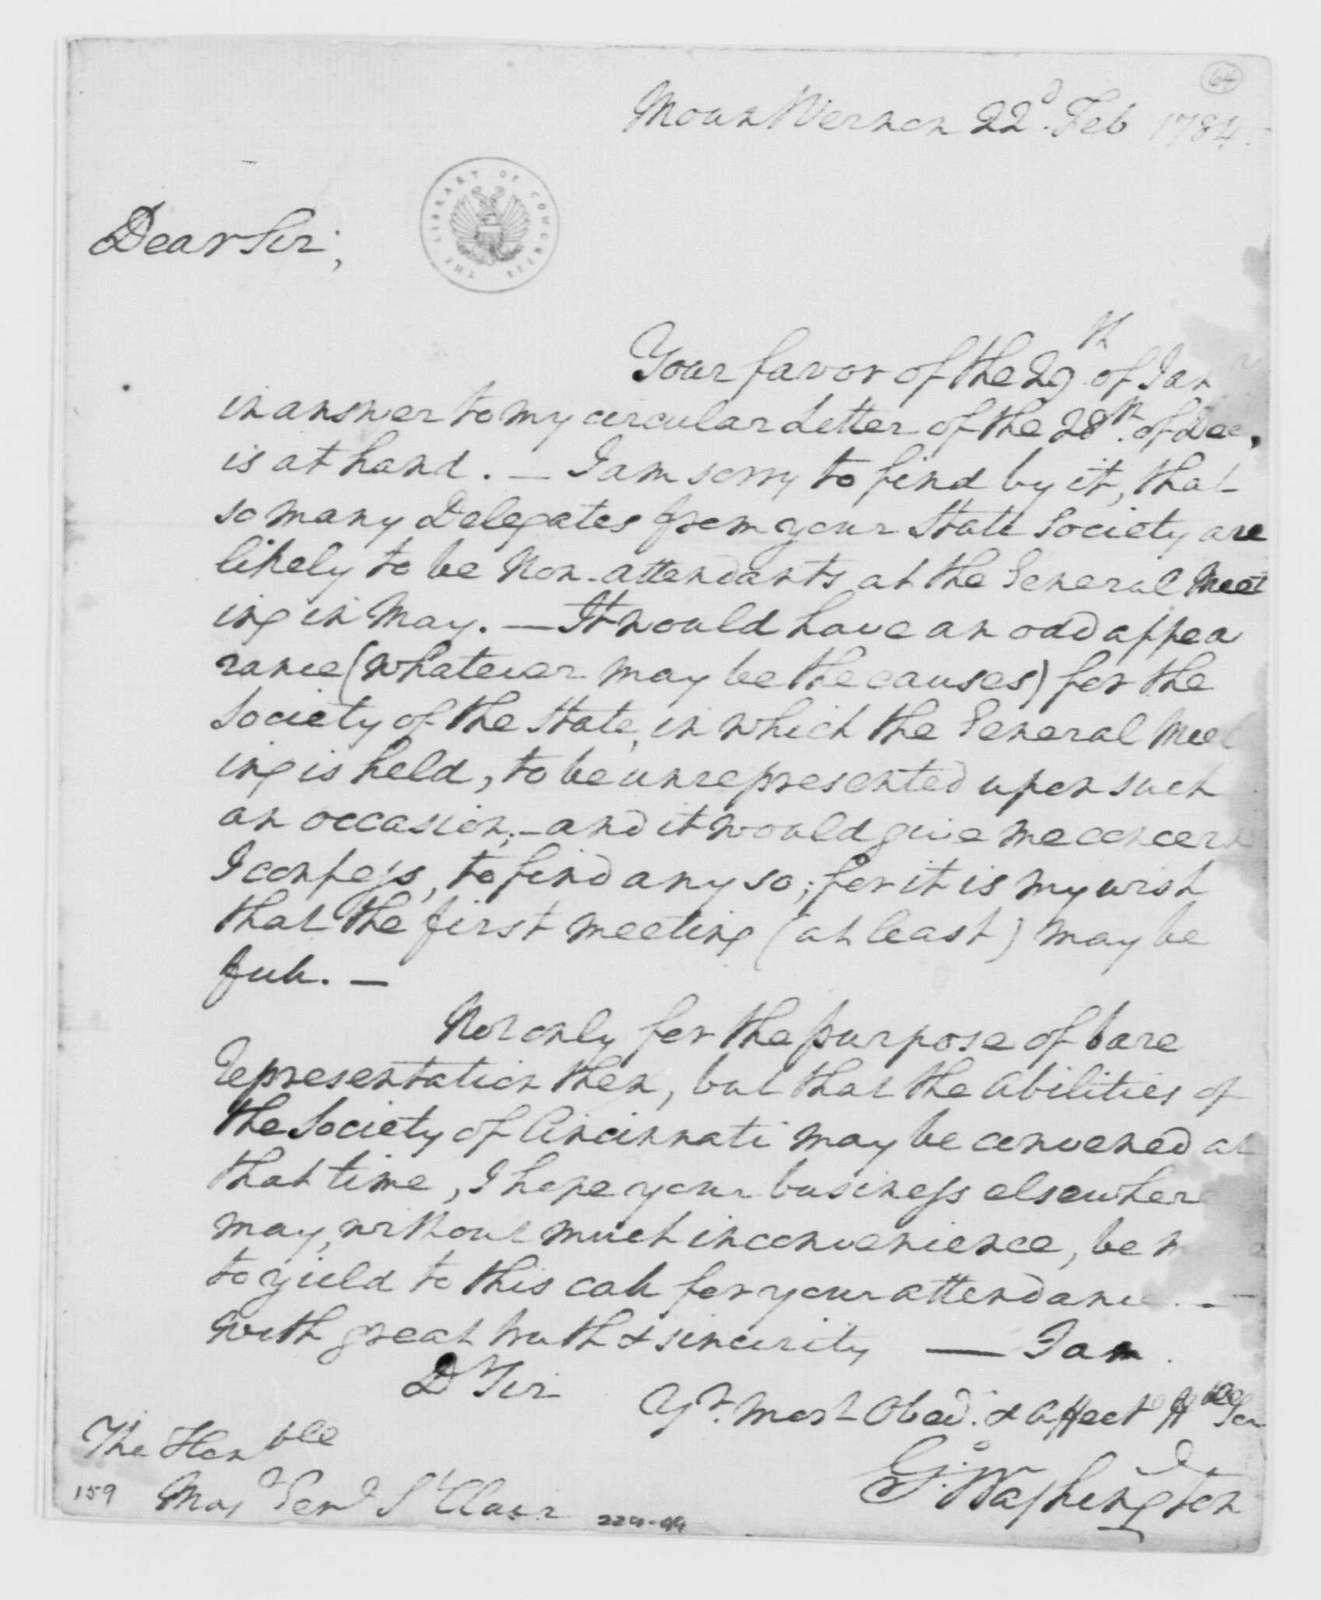 George Washington Papers, Series 4, General Correspondence: George Washington to Arthur St. Clair, February 22, 1784